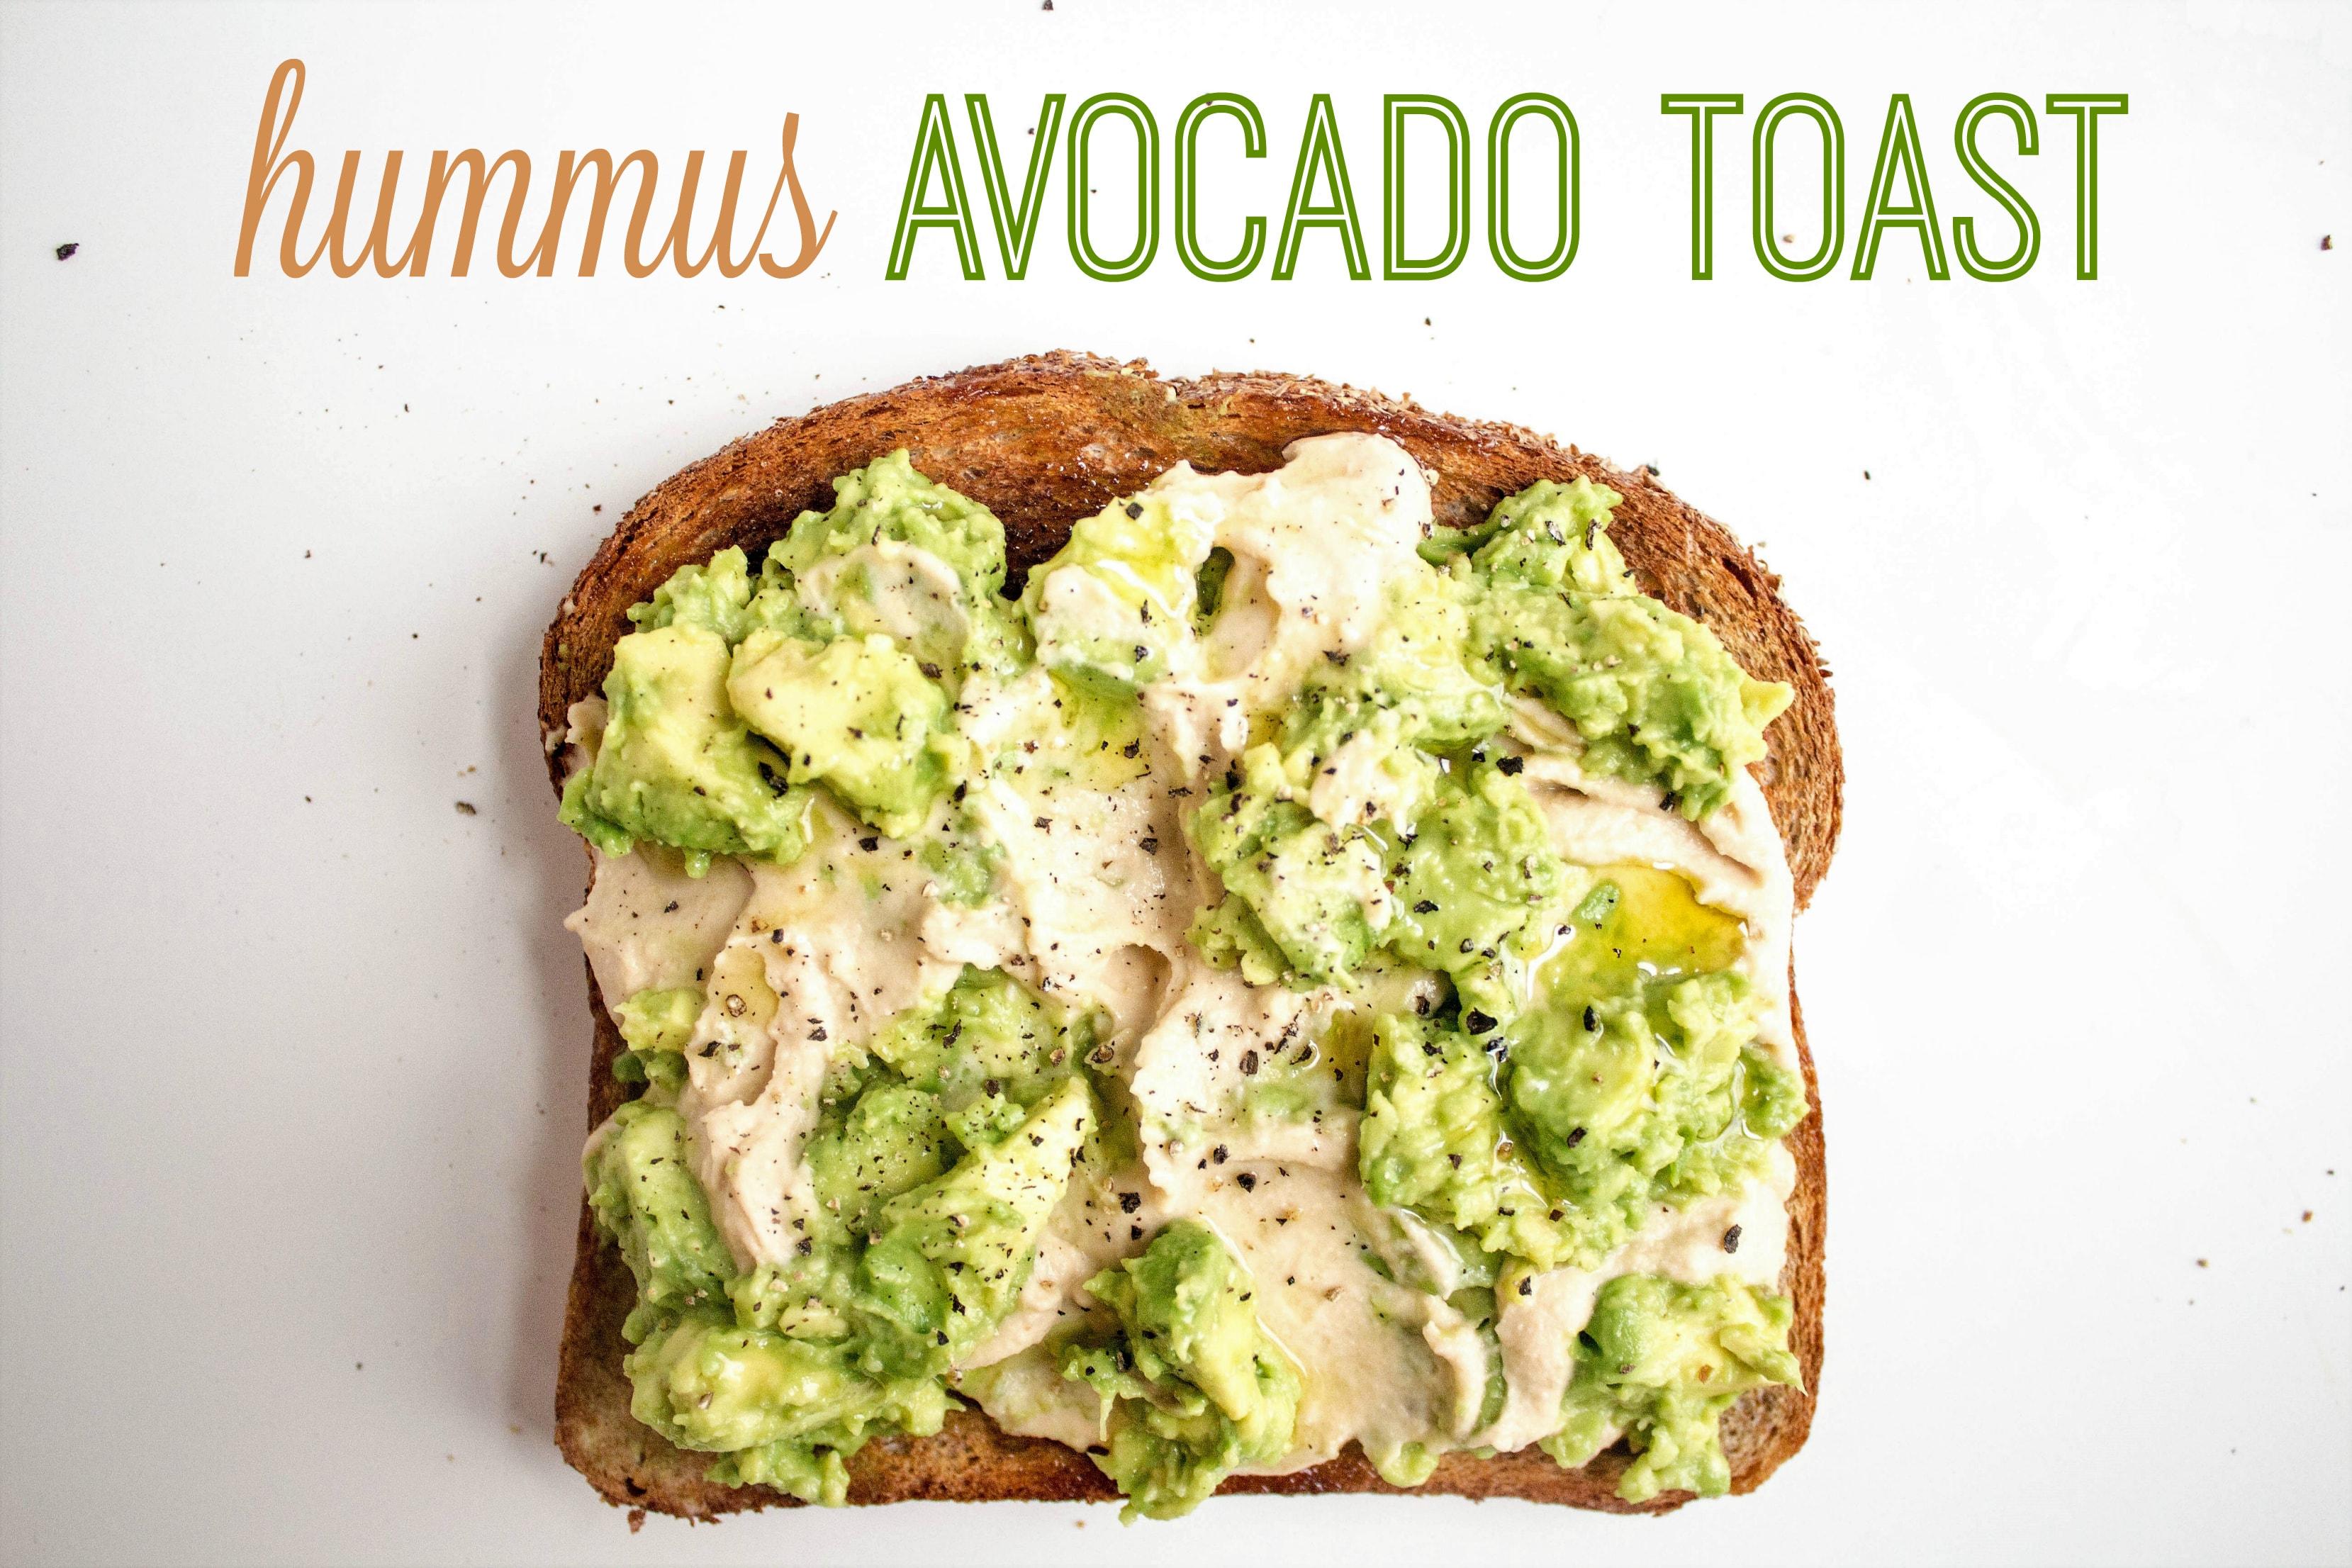 Black Bean & Salsa Avocado Toast: Top your avocado toast with salsa ...